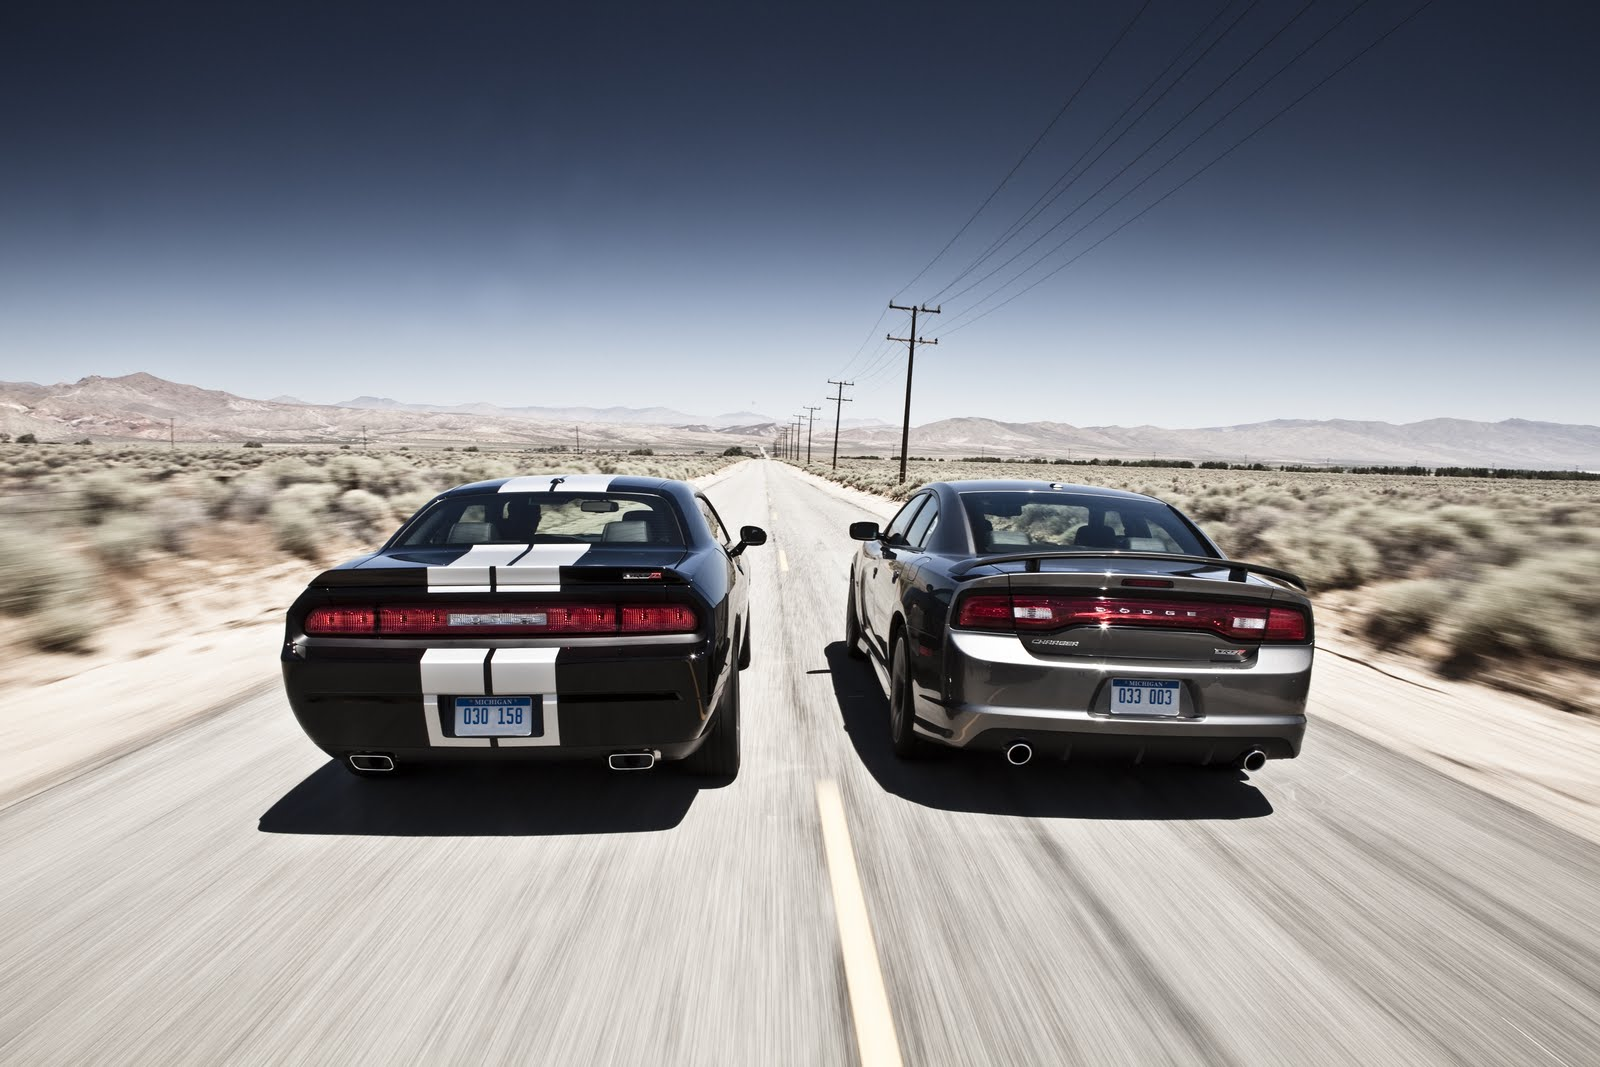 2012 dodge charger srt8 vs 2011 dodge challenger srt8. Cars Review. Best American Auto & Cars Review